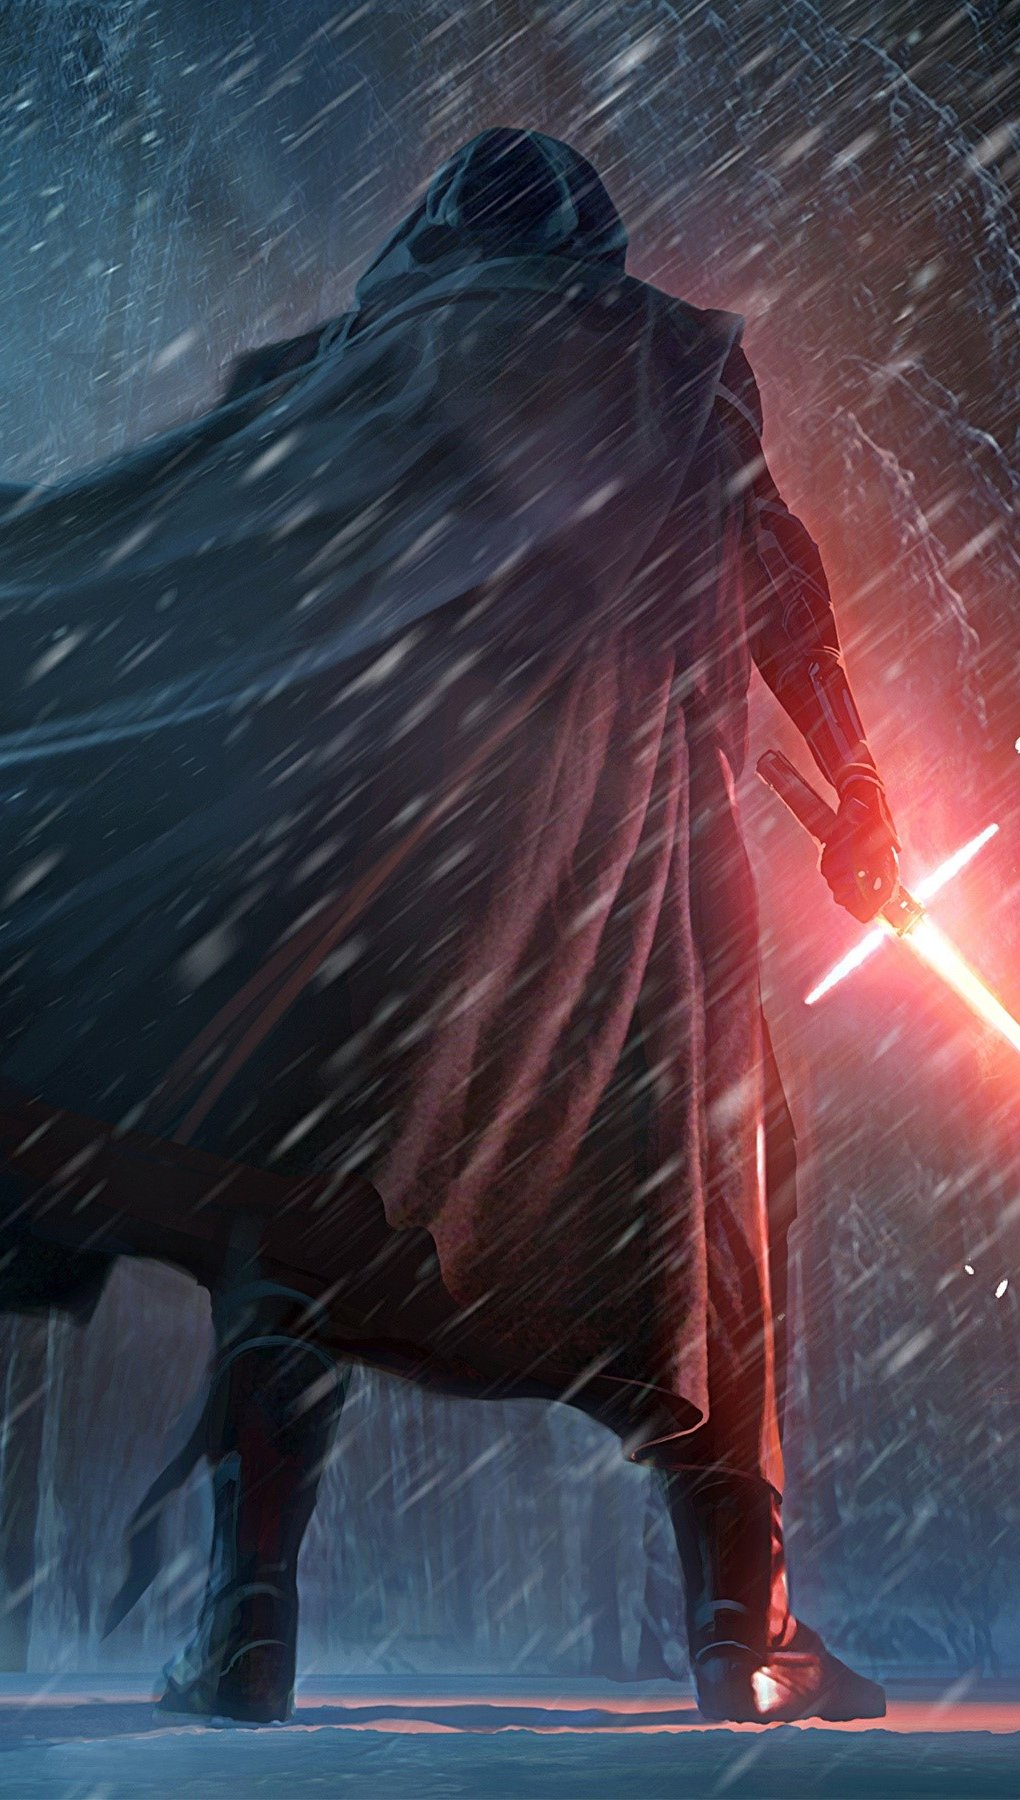 Wallpaper Artwork by Kylo Ren in Star Wars Vertical